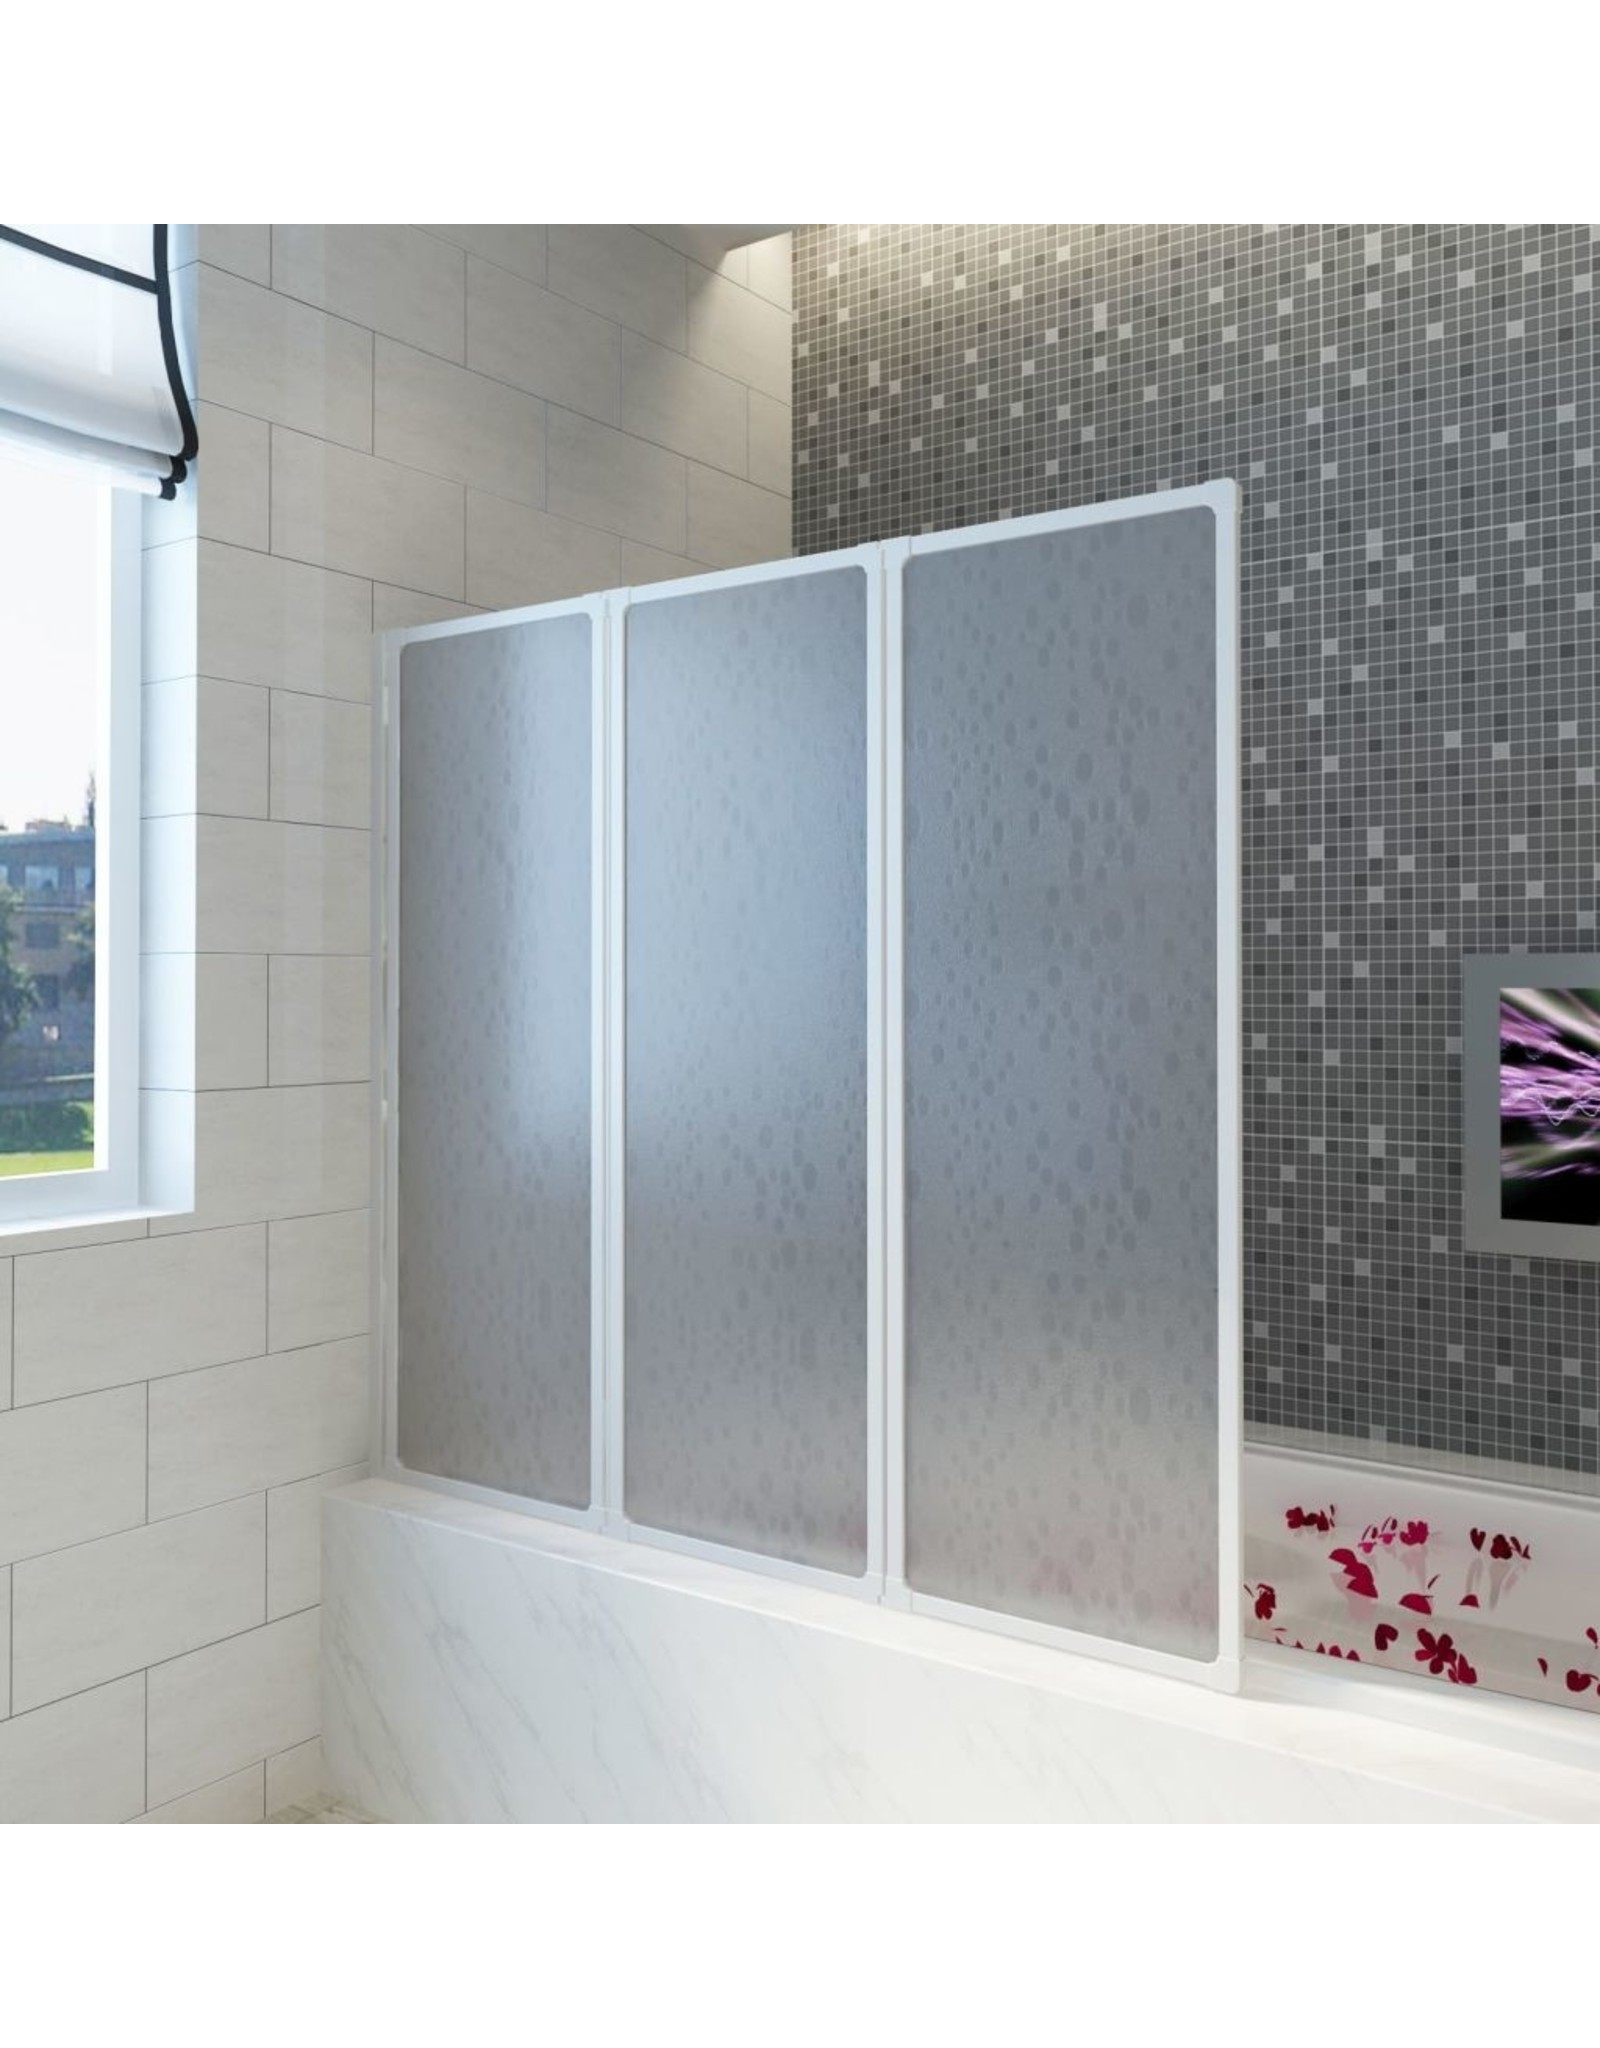 Badscherm 3 panelen vouwbaar 117 x 120 cm